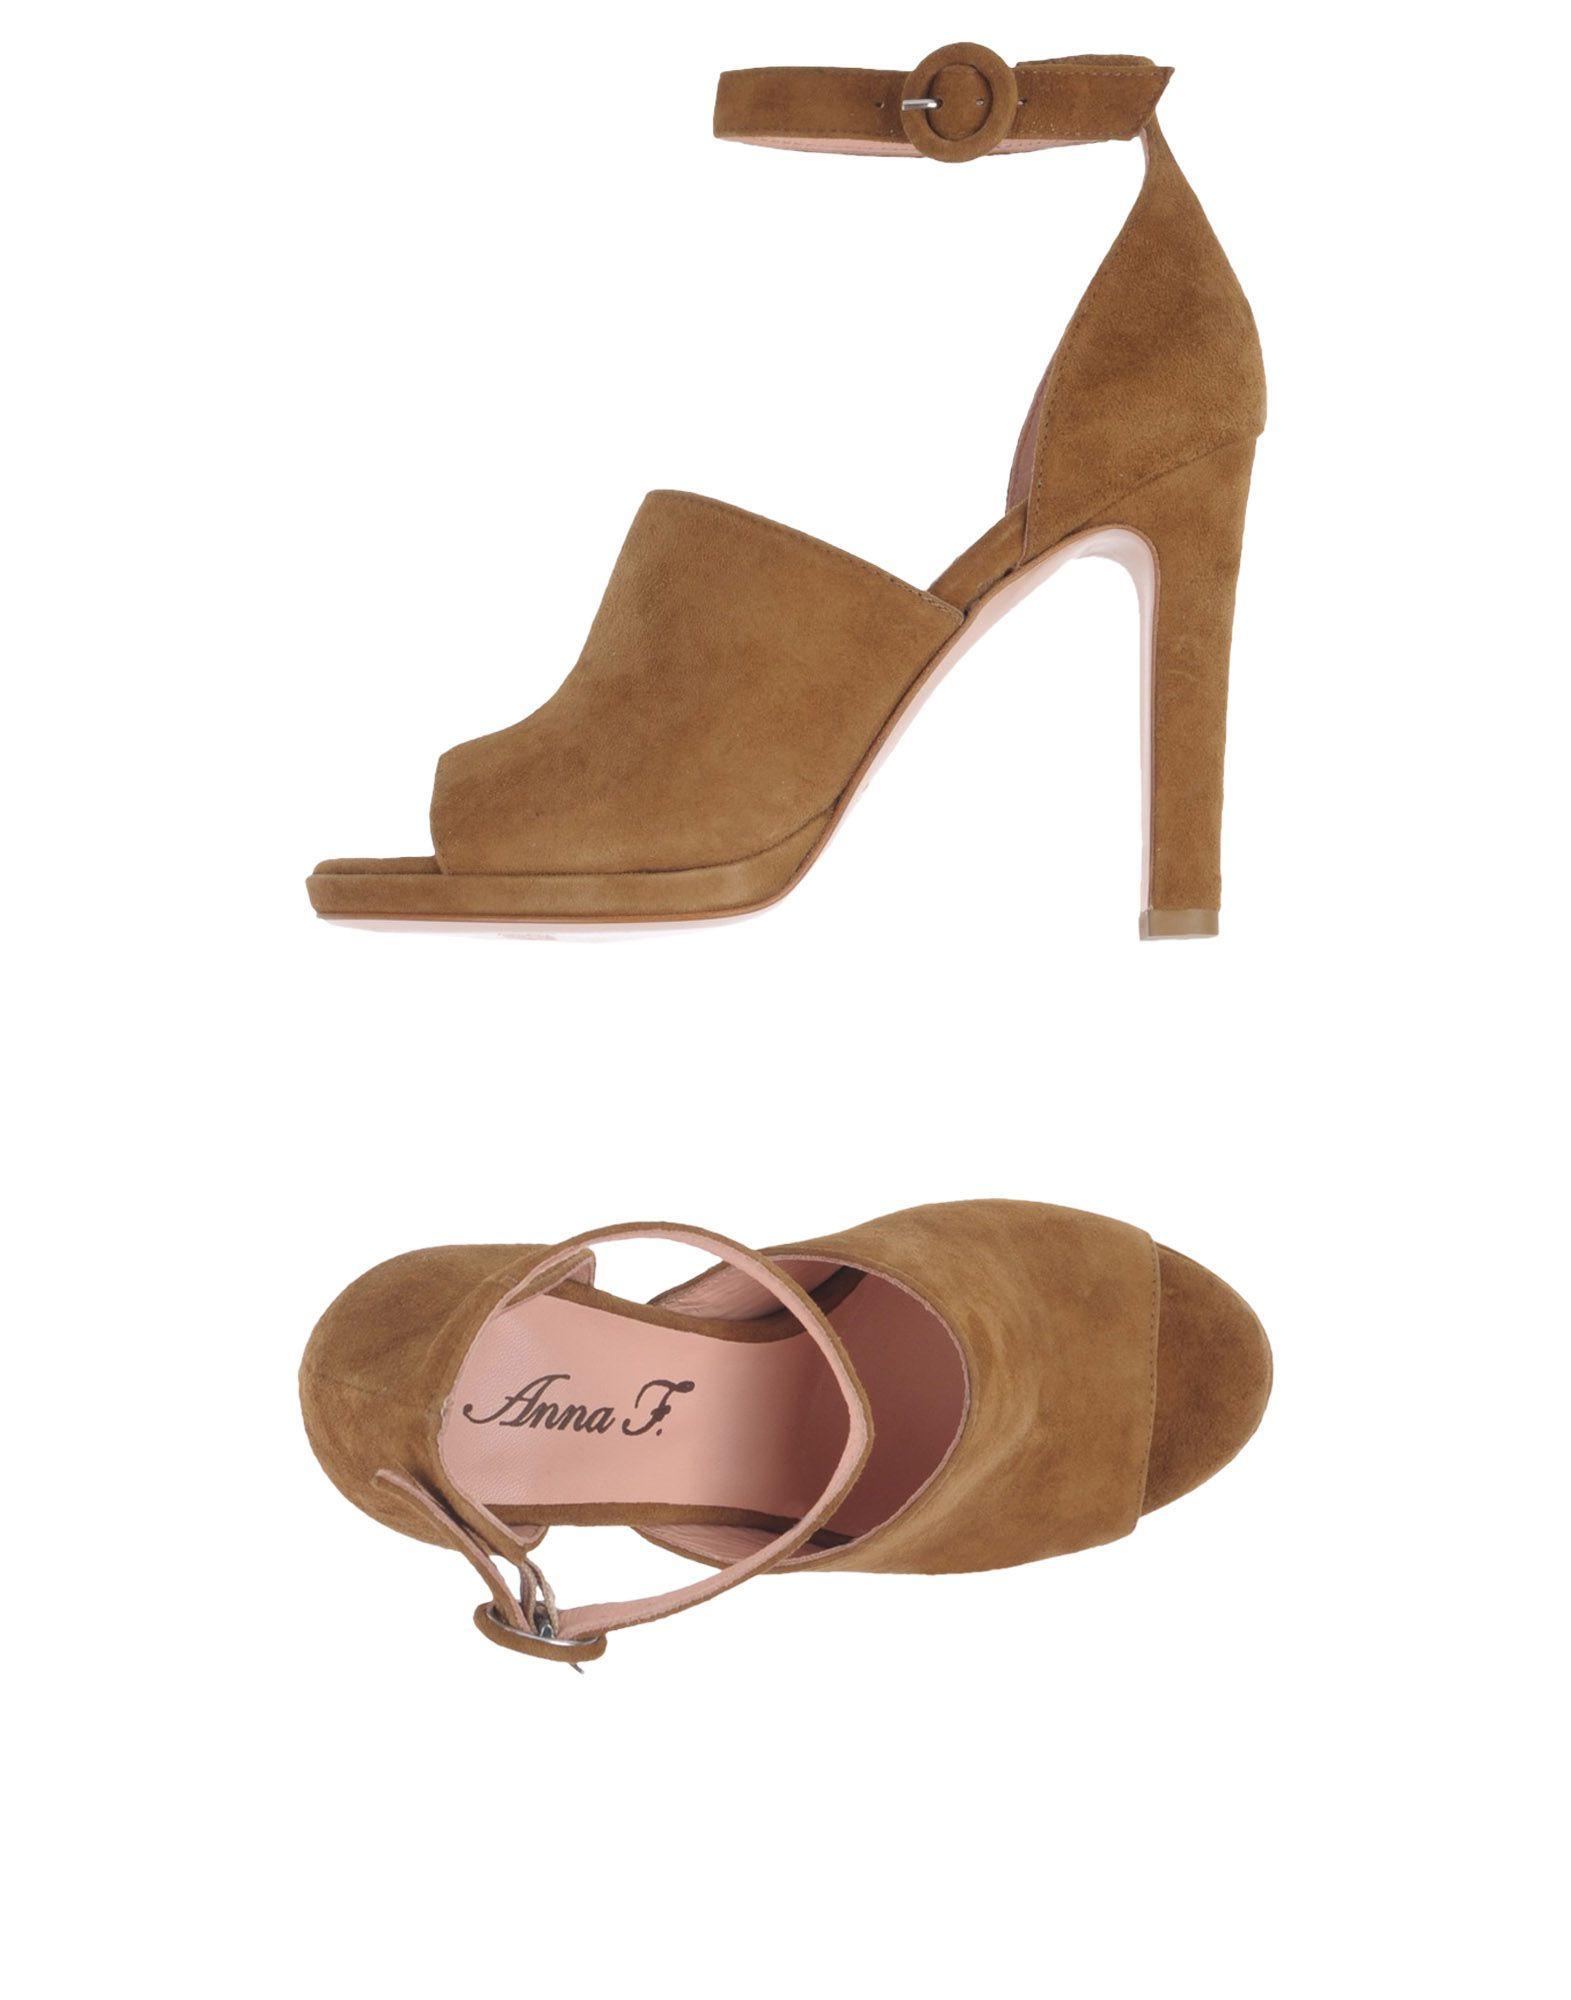 Anna F. Sandalen Damen  11380230OQ Gute Qualität beliebte Schuhe